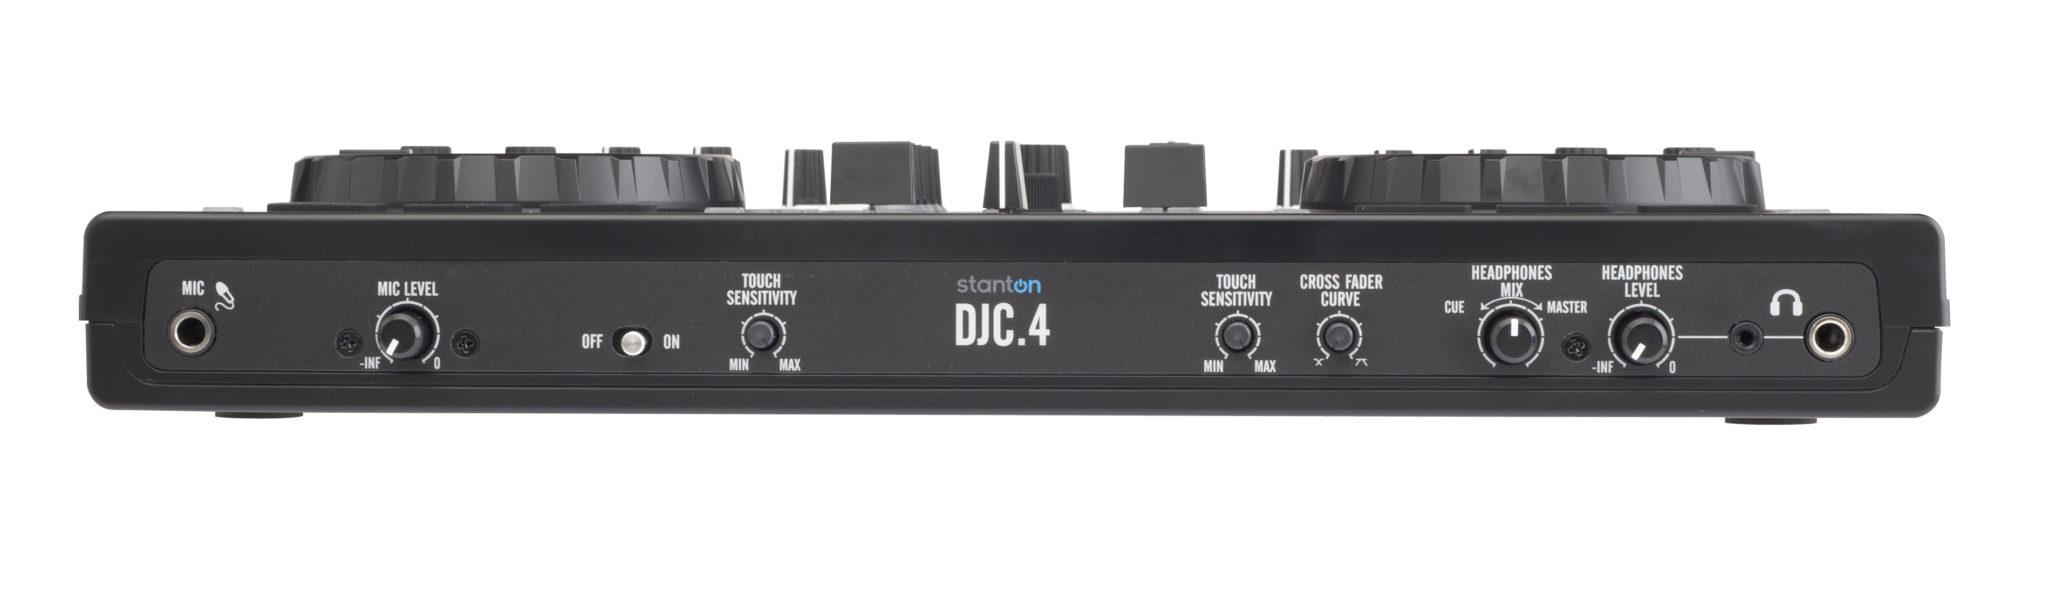 djc4_front